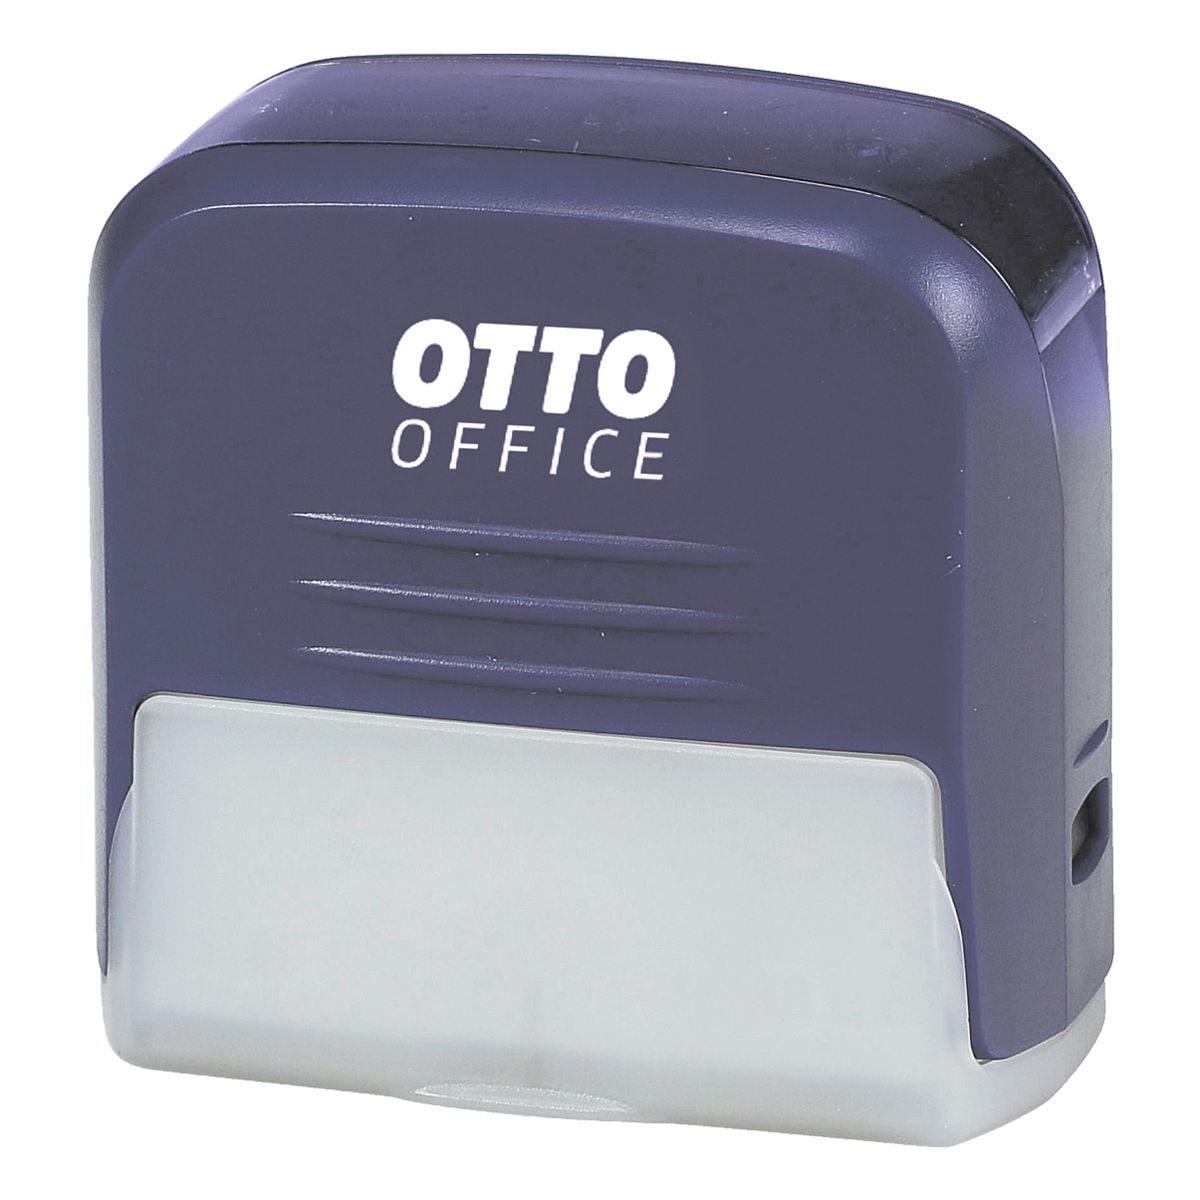 otto office textstempel 30 bei otto office g nstig kaufen